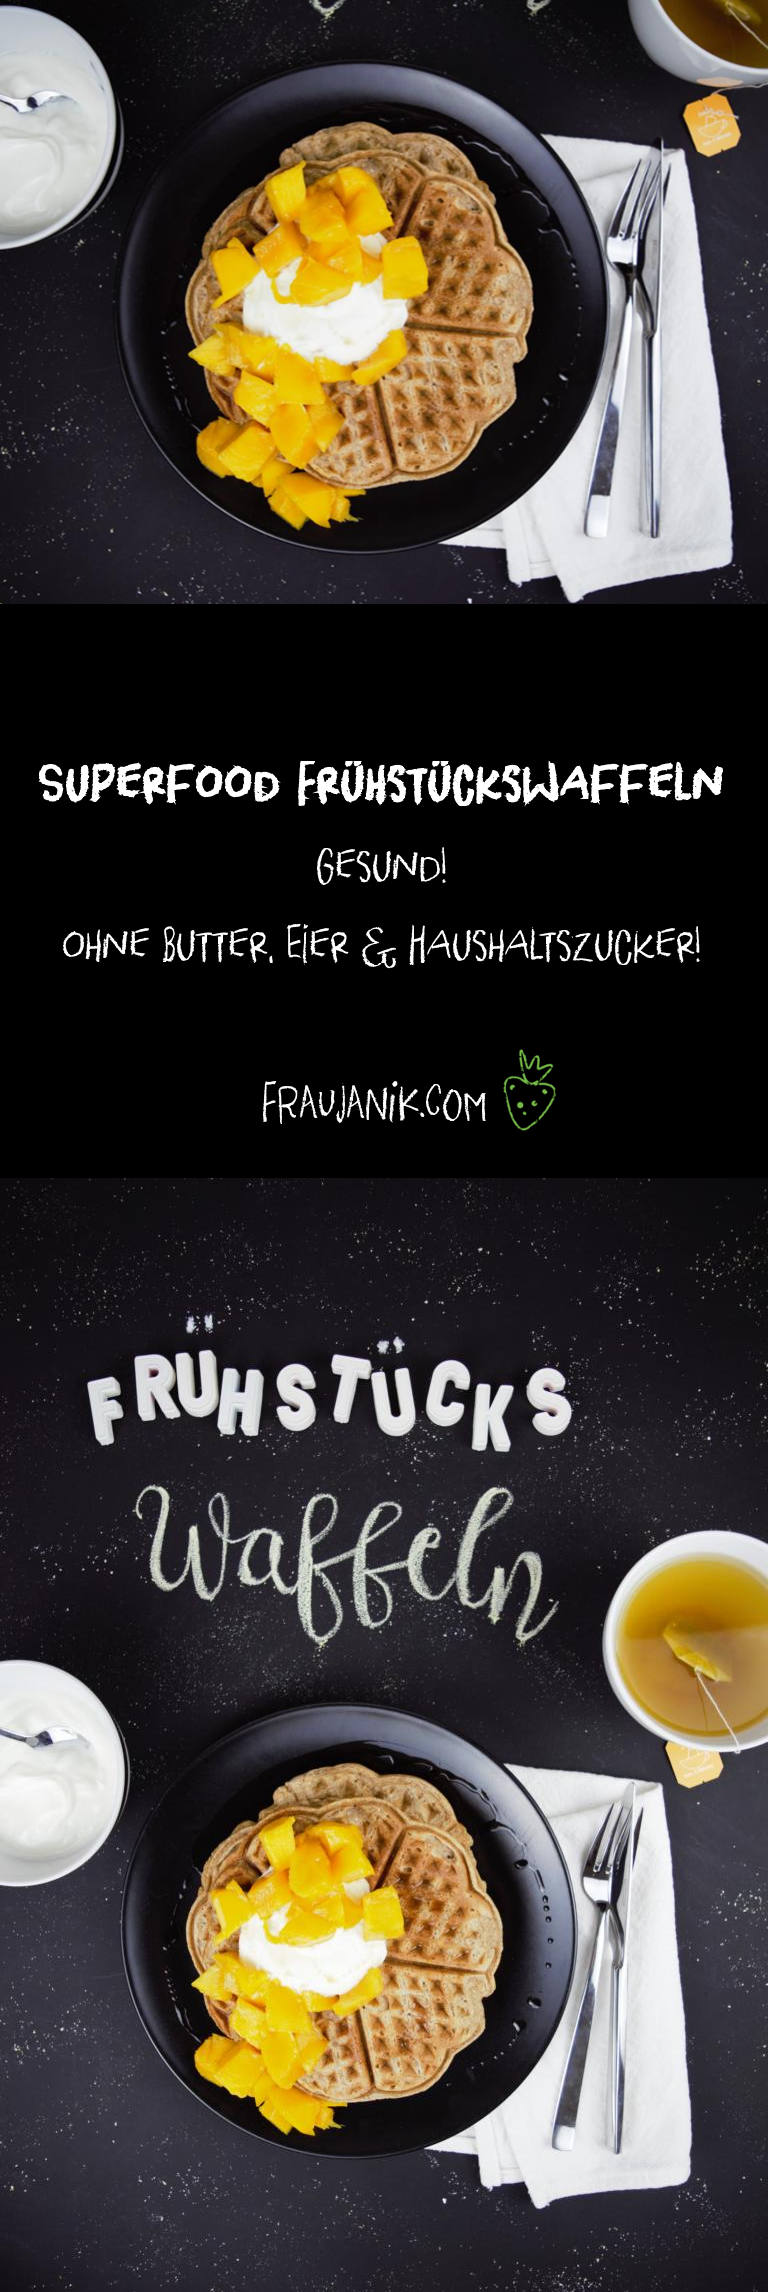 gesunde Superfood Frühstückswaffeln